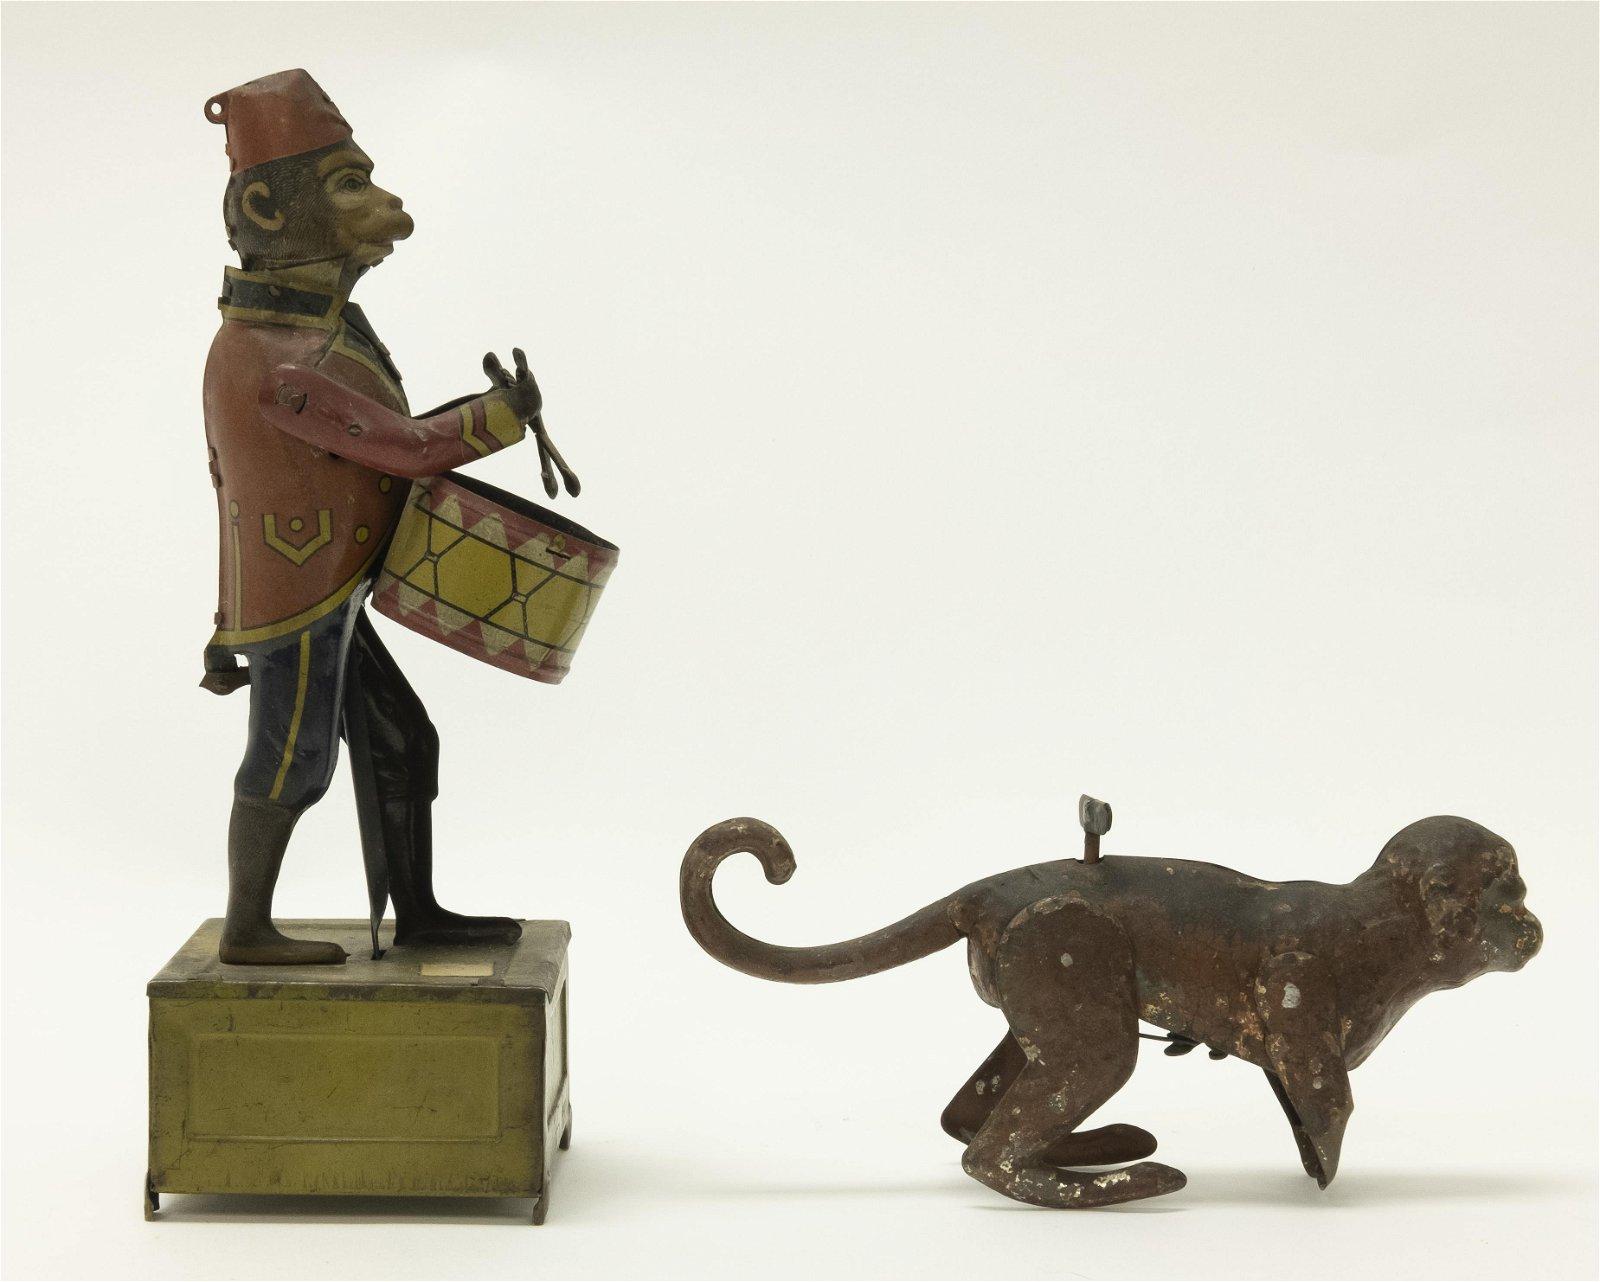 Windup Distler Monkey Drummer & Hopping Monkey